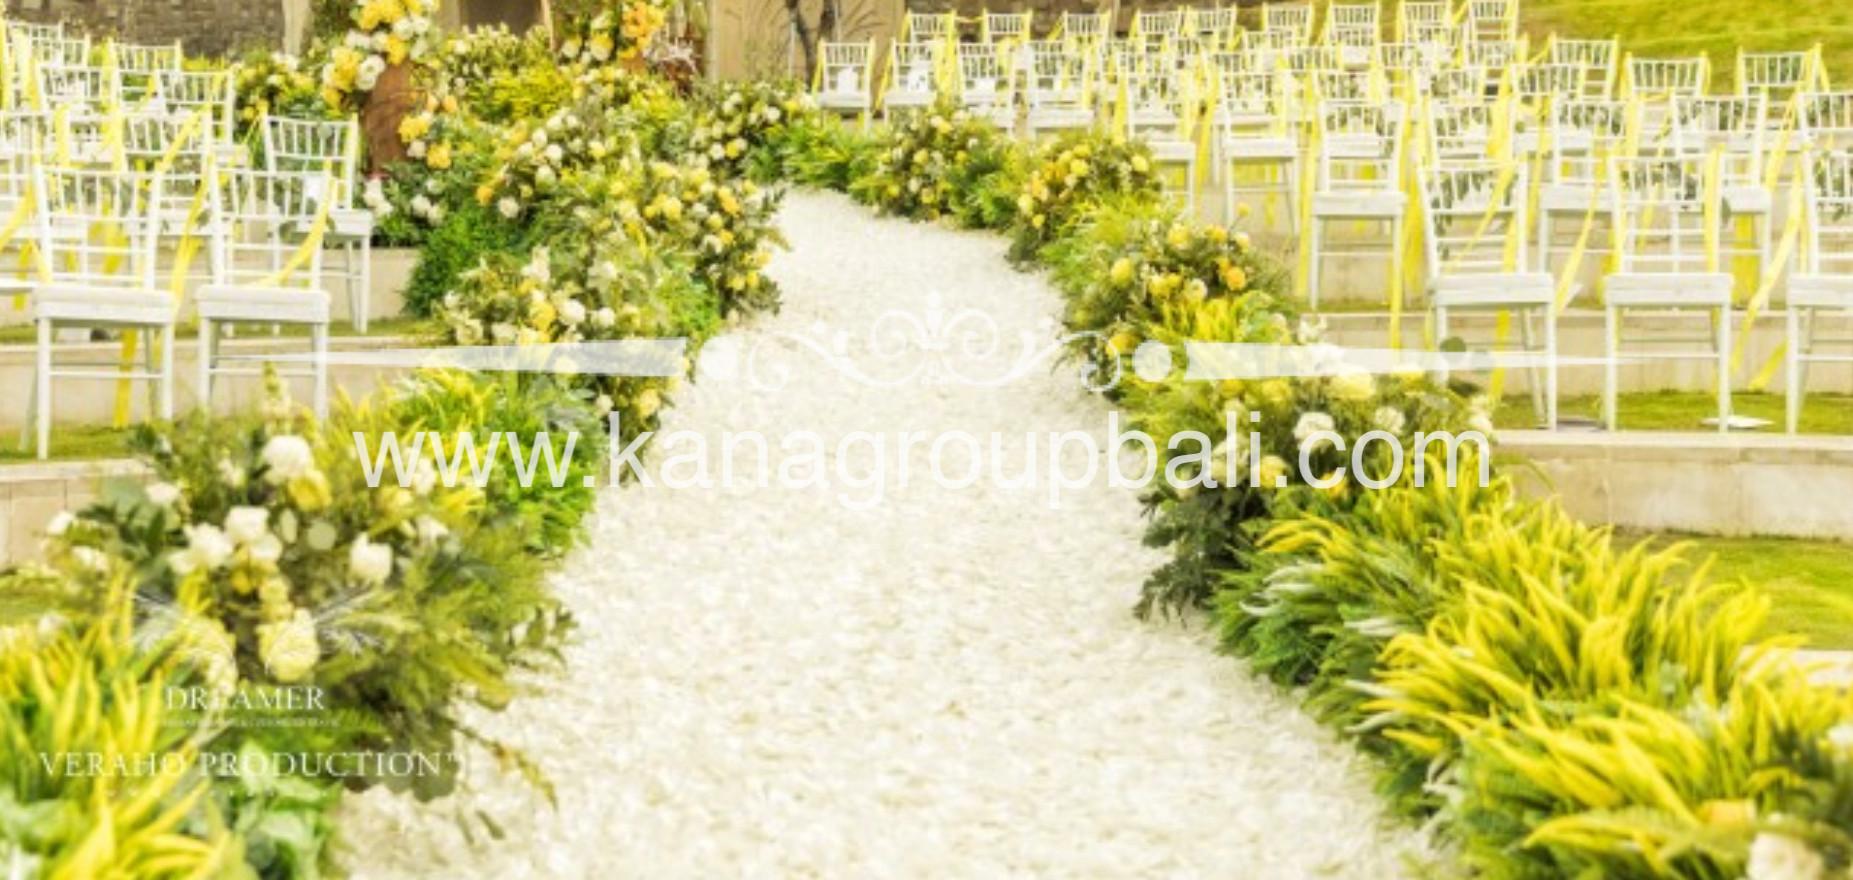 flower bushes and flower petals.jpg